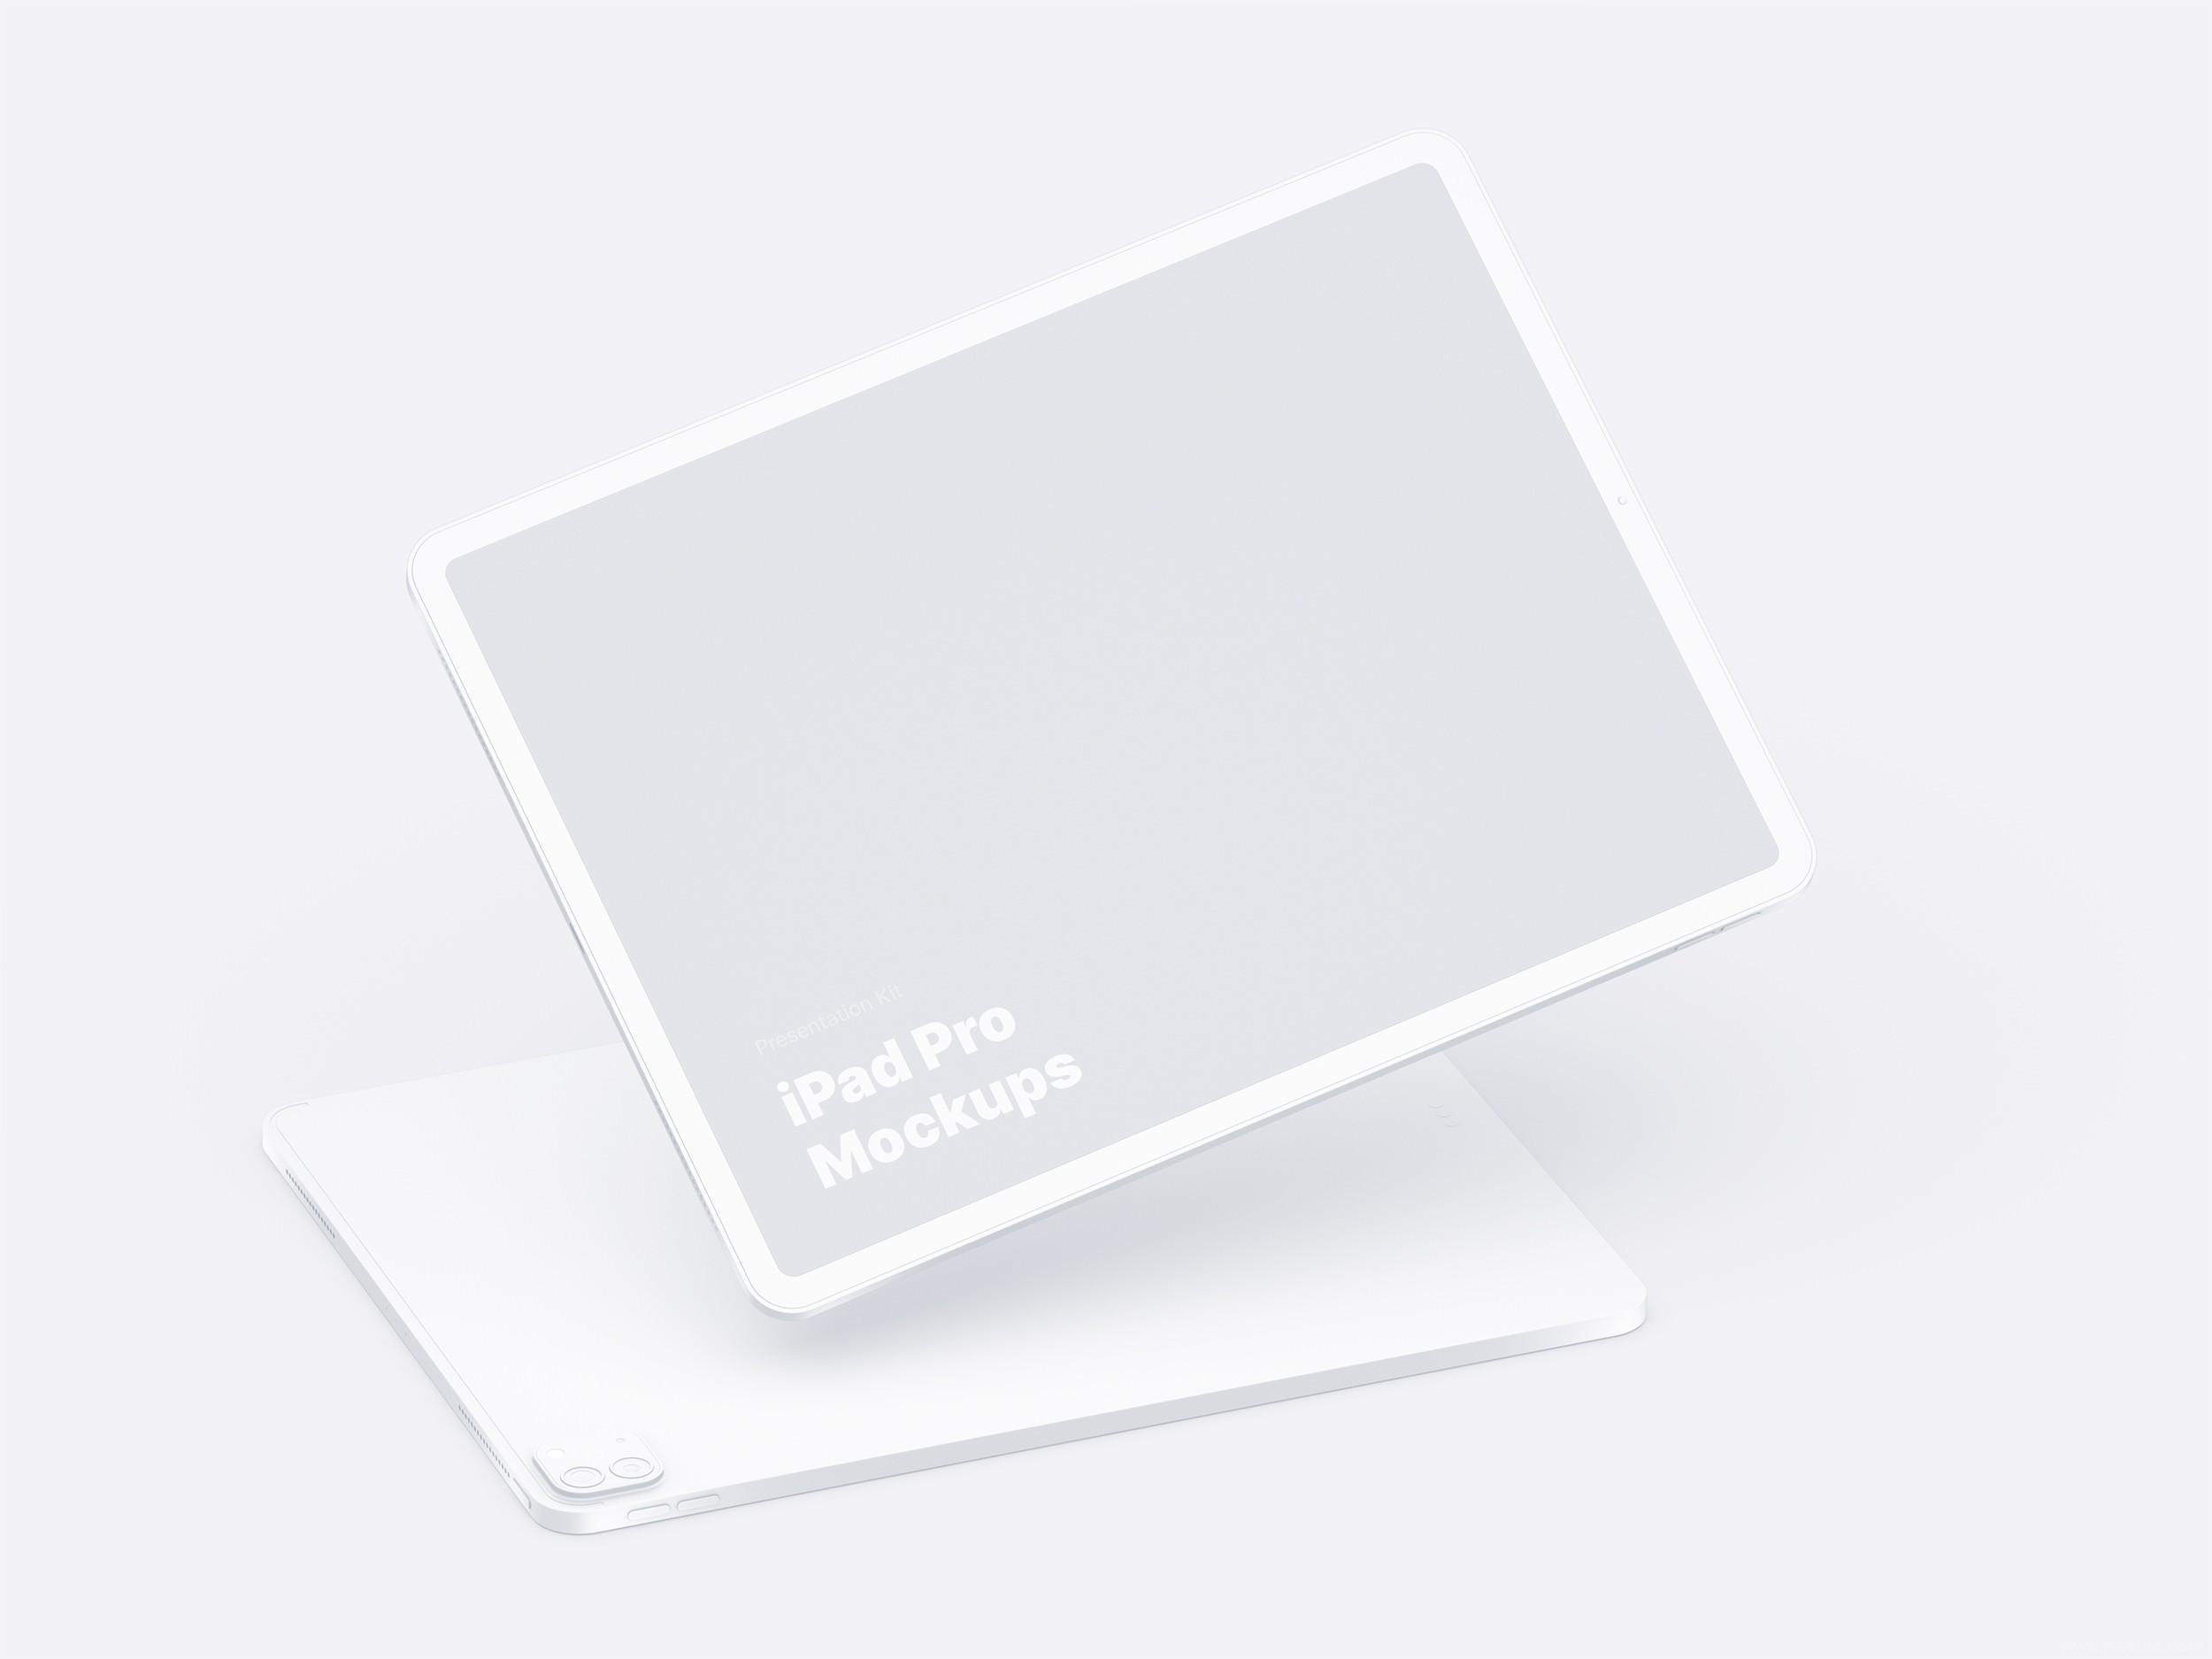 iPad pro 样机模板,iPad pro mockup,fig源文件、sketch源文件、psd源文件